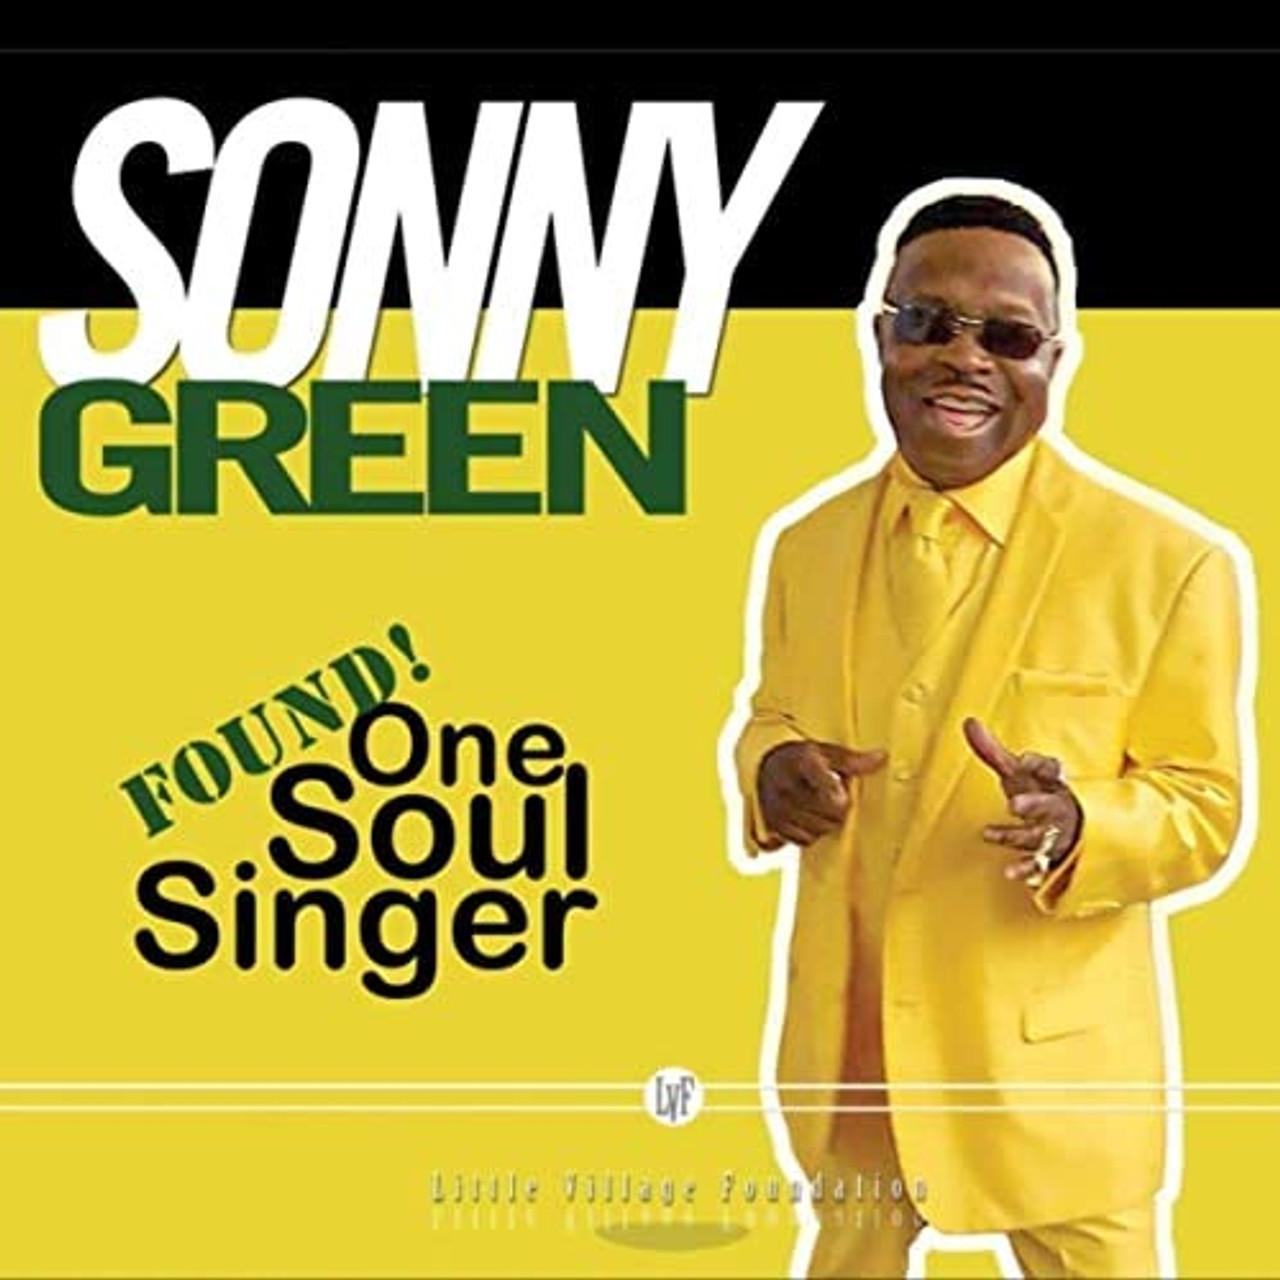 SONNY GREEN - FOUND ONE SOUL SINGER